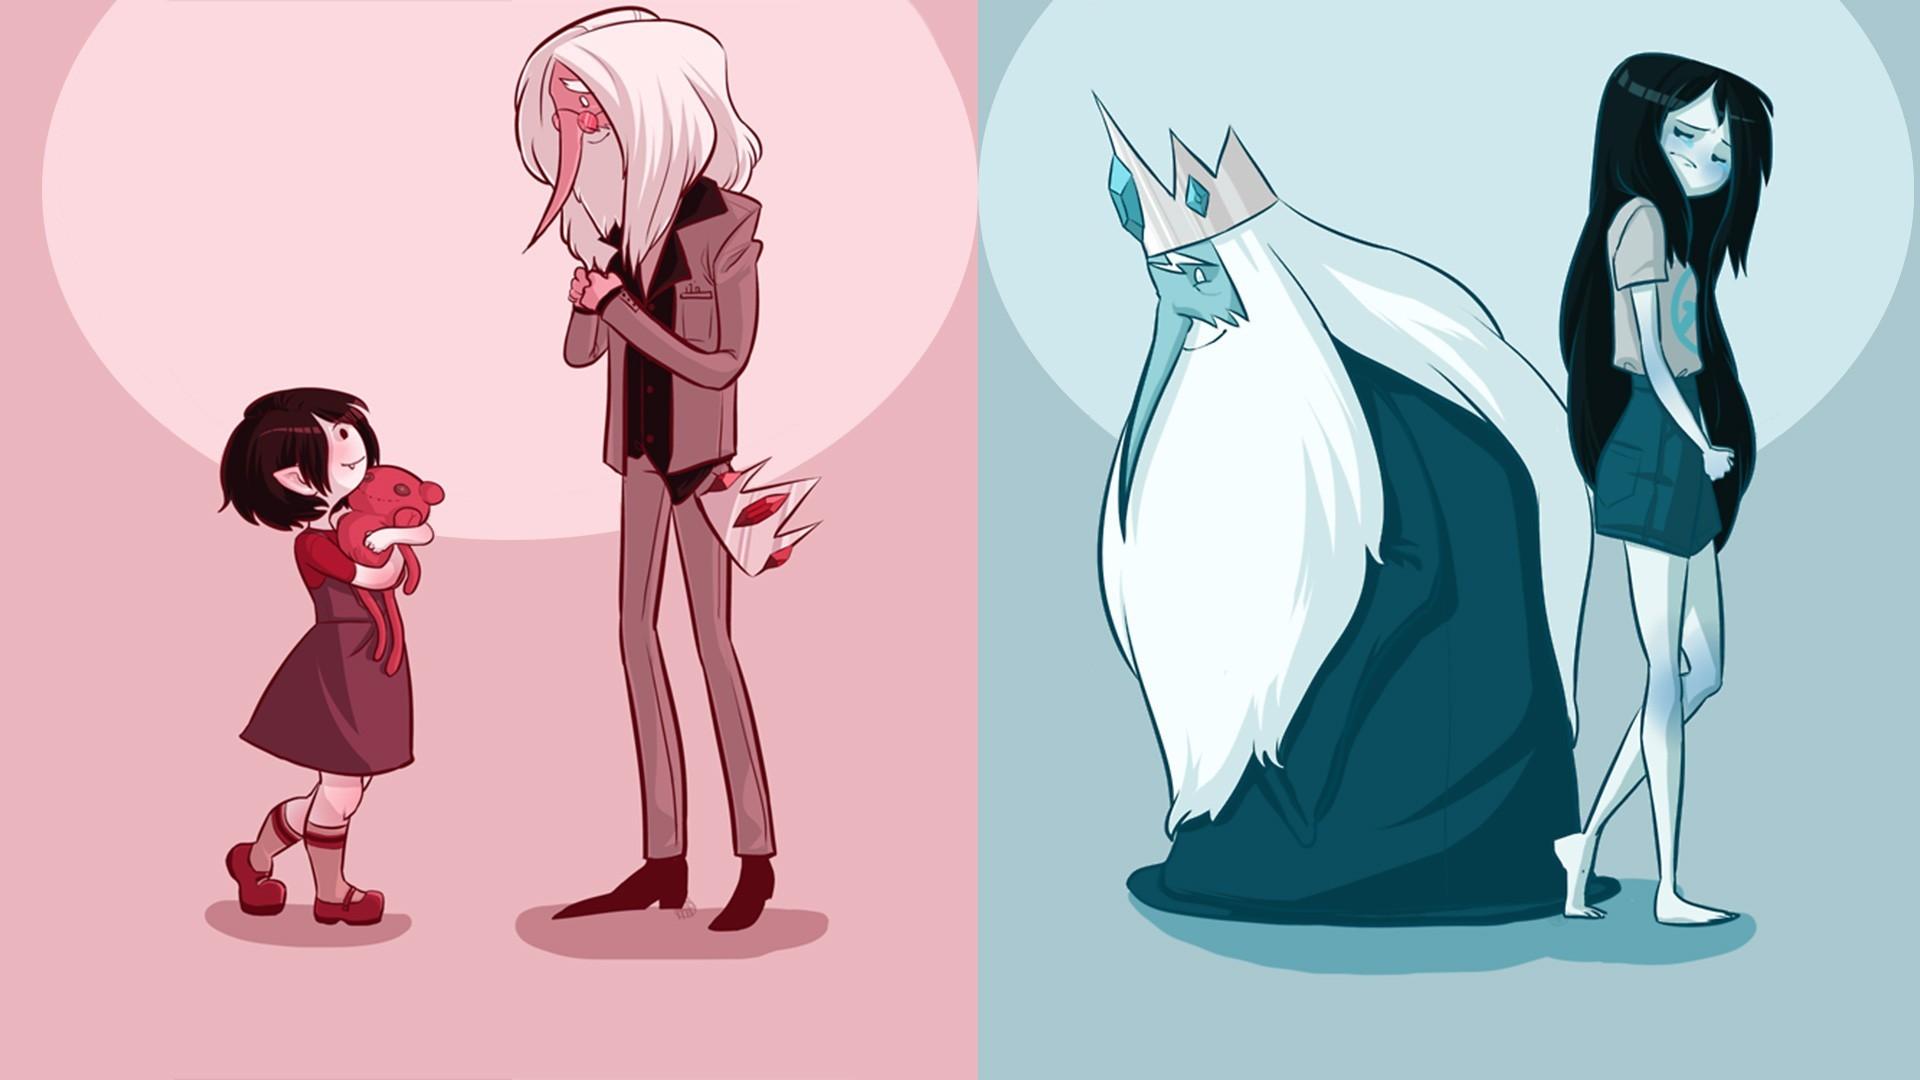 Anime Adventure Time Pictures wallpaper : illustration, anime, cartoon, adventure time